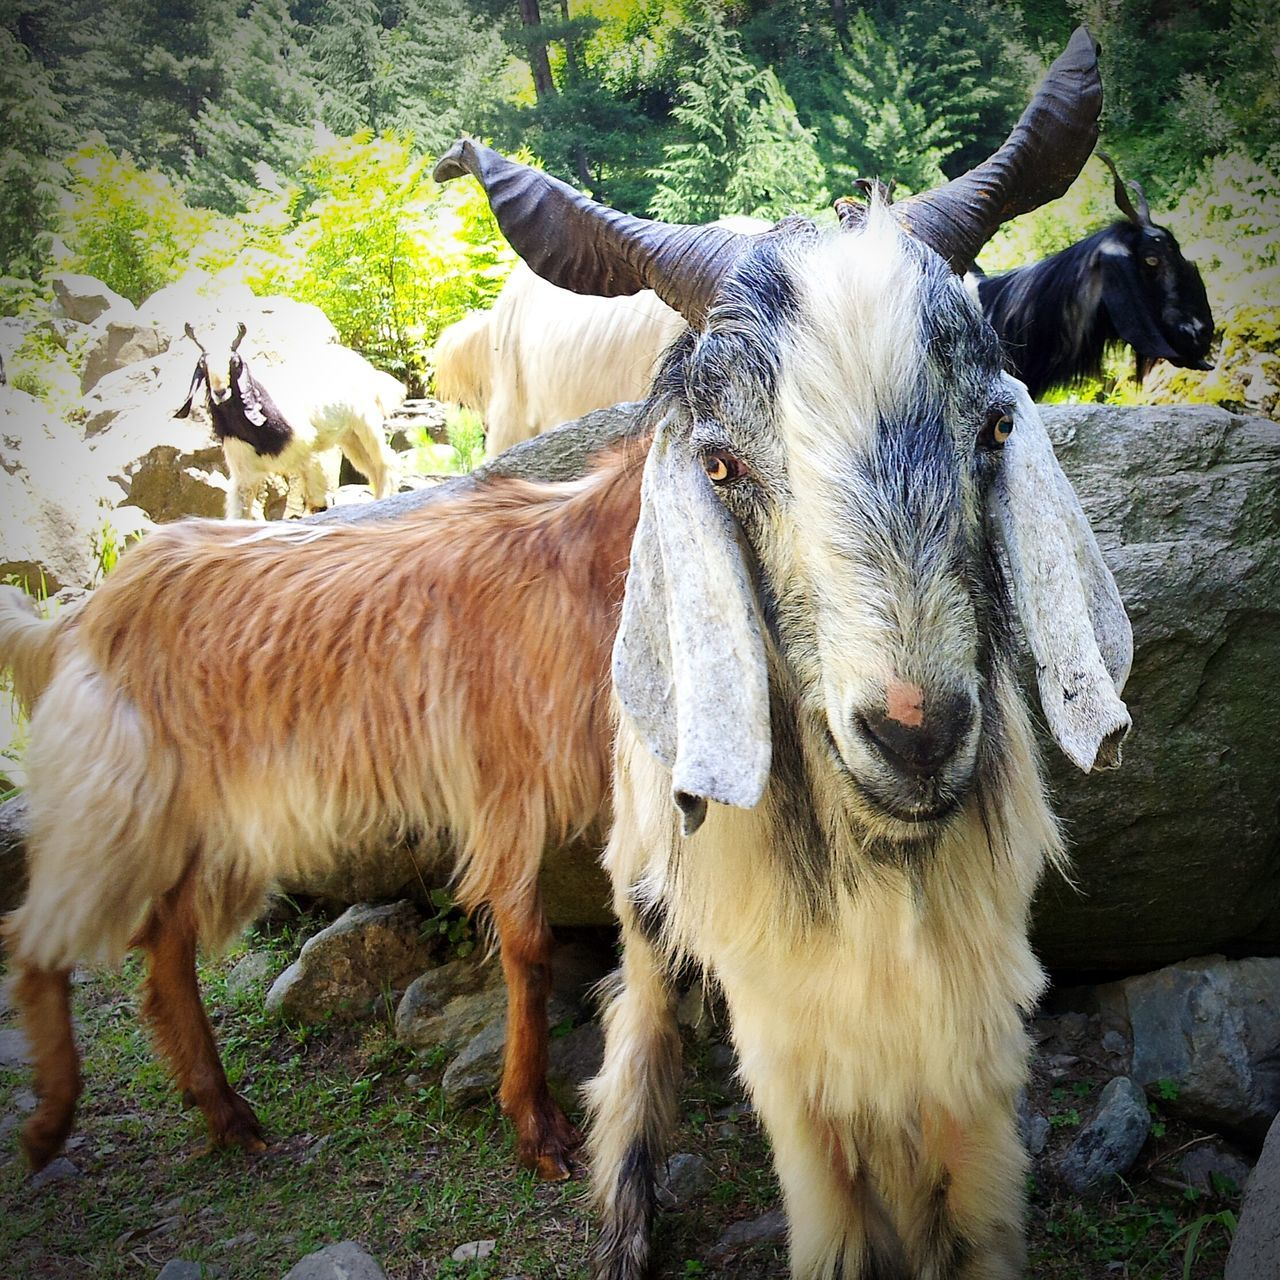 Goat Goats Animals Kashmir Baramulla Uri Animal Domestic Animal Goat Selfie Mountain Goat